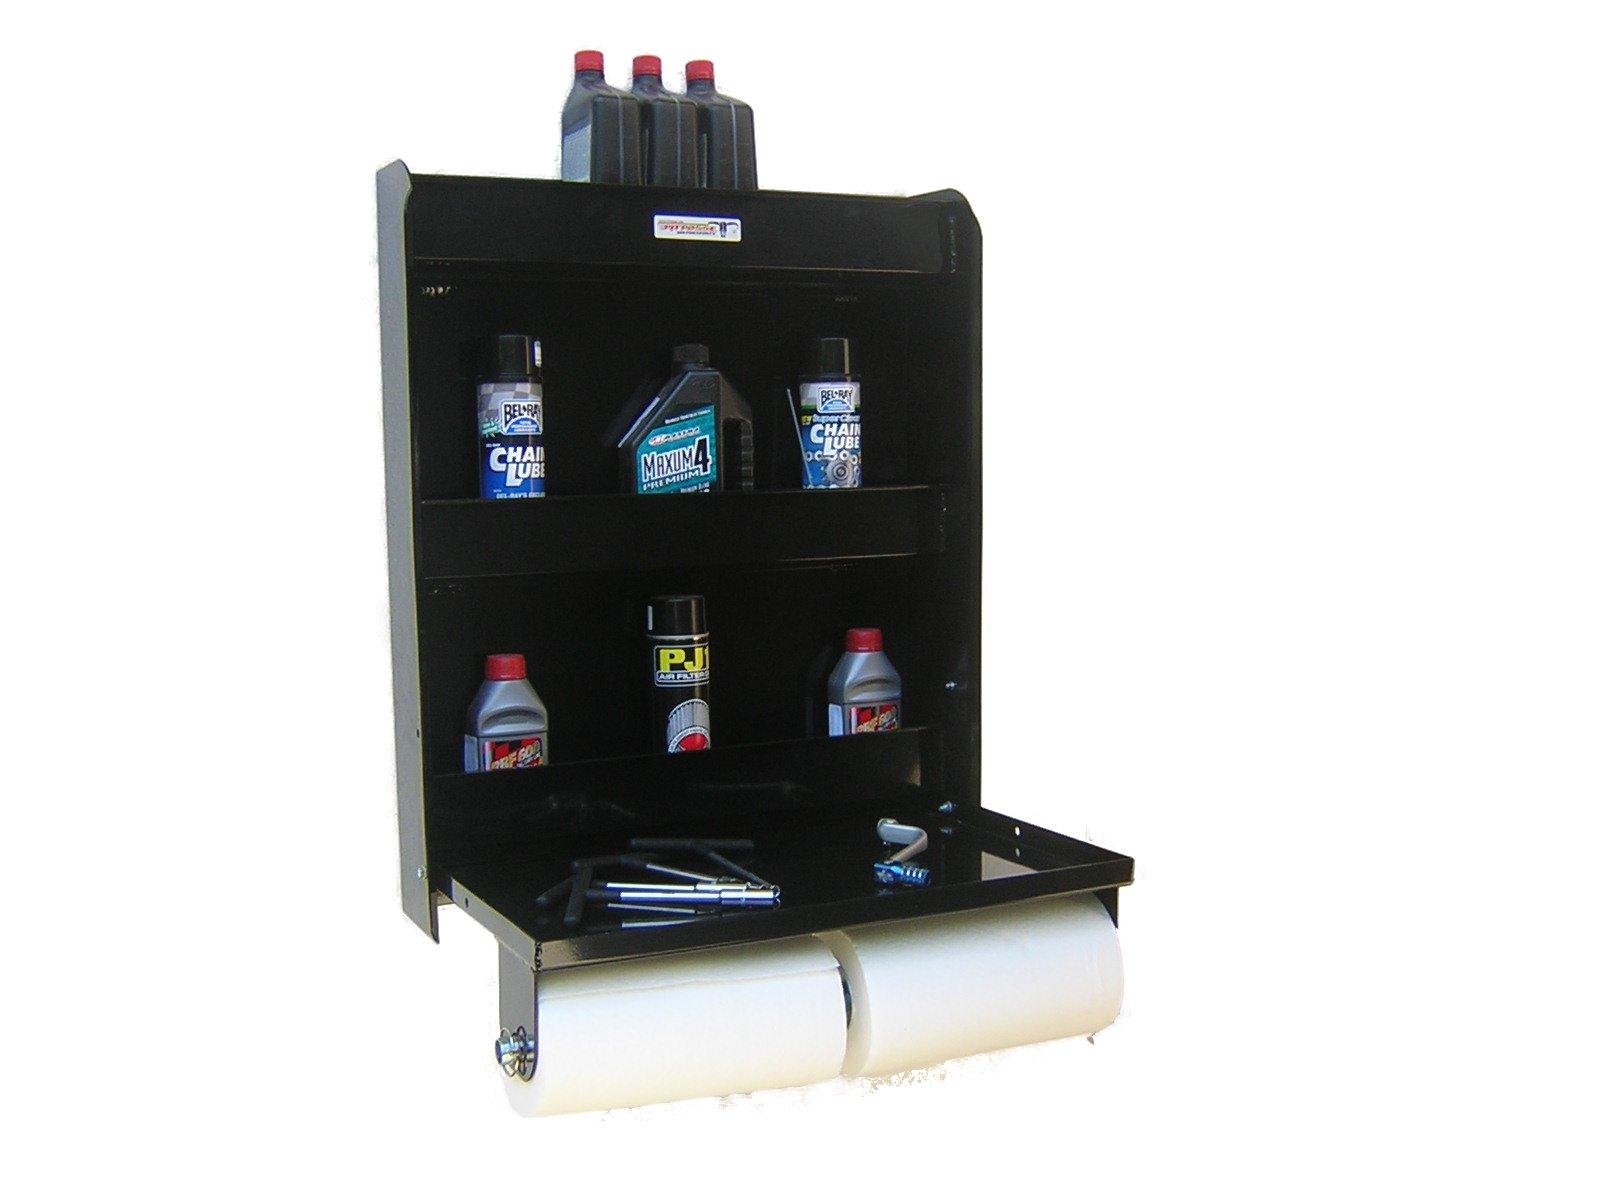 Pit Posse Aluminum Work Station Storage Cabinet Trailer Shop Shelf Race Enclosed Trailer Black